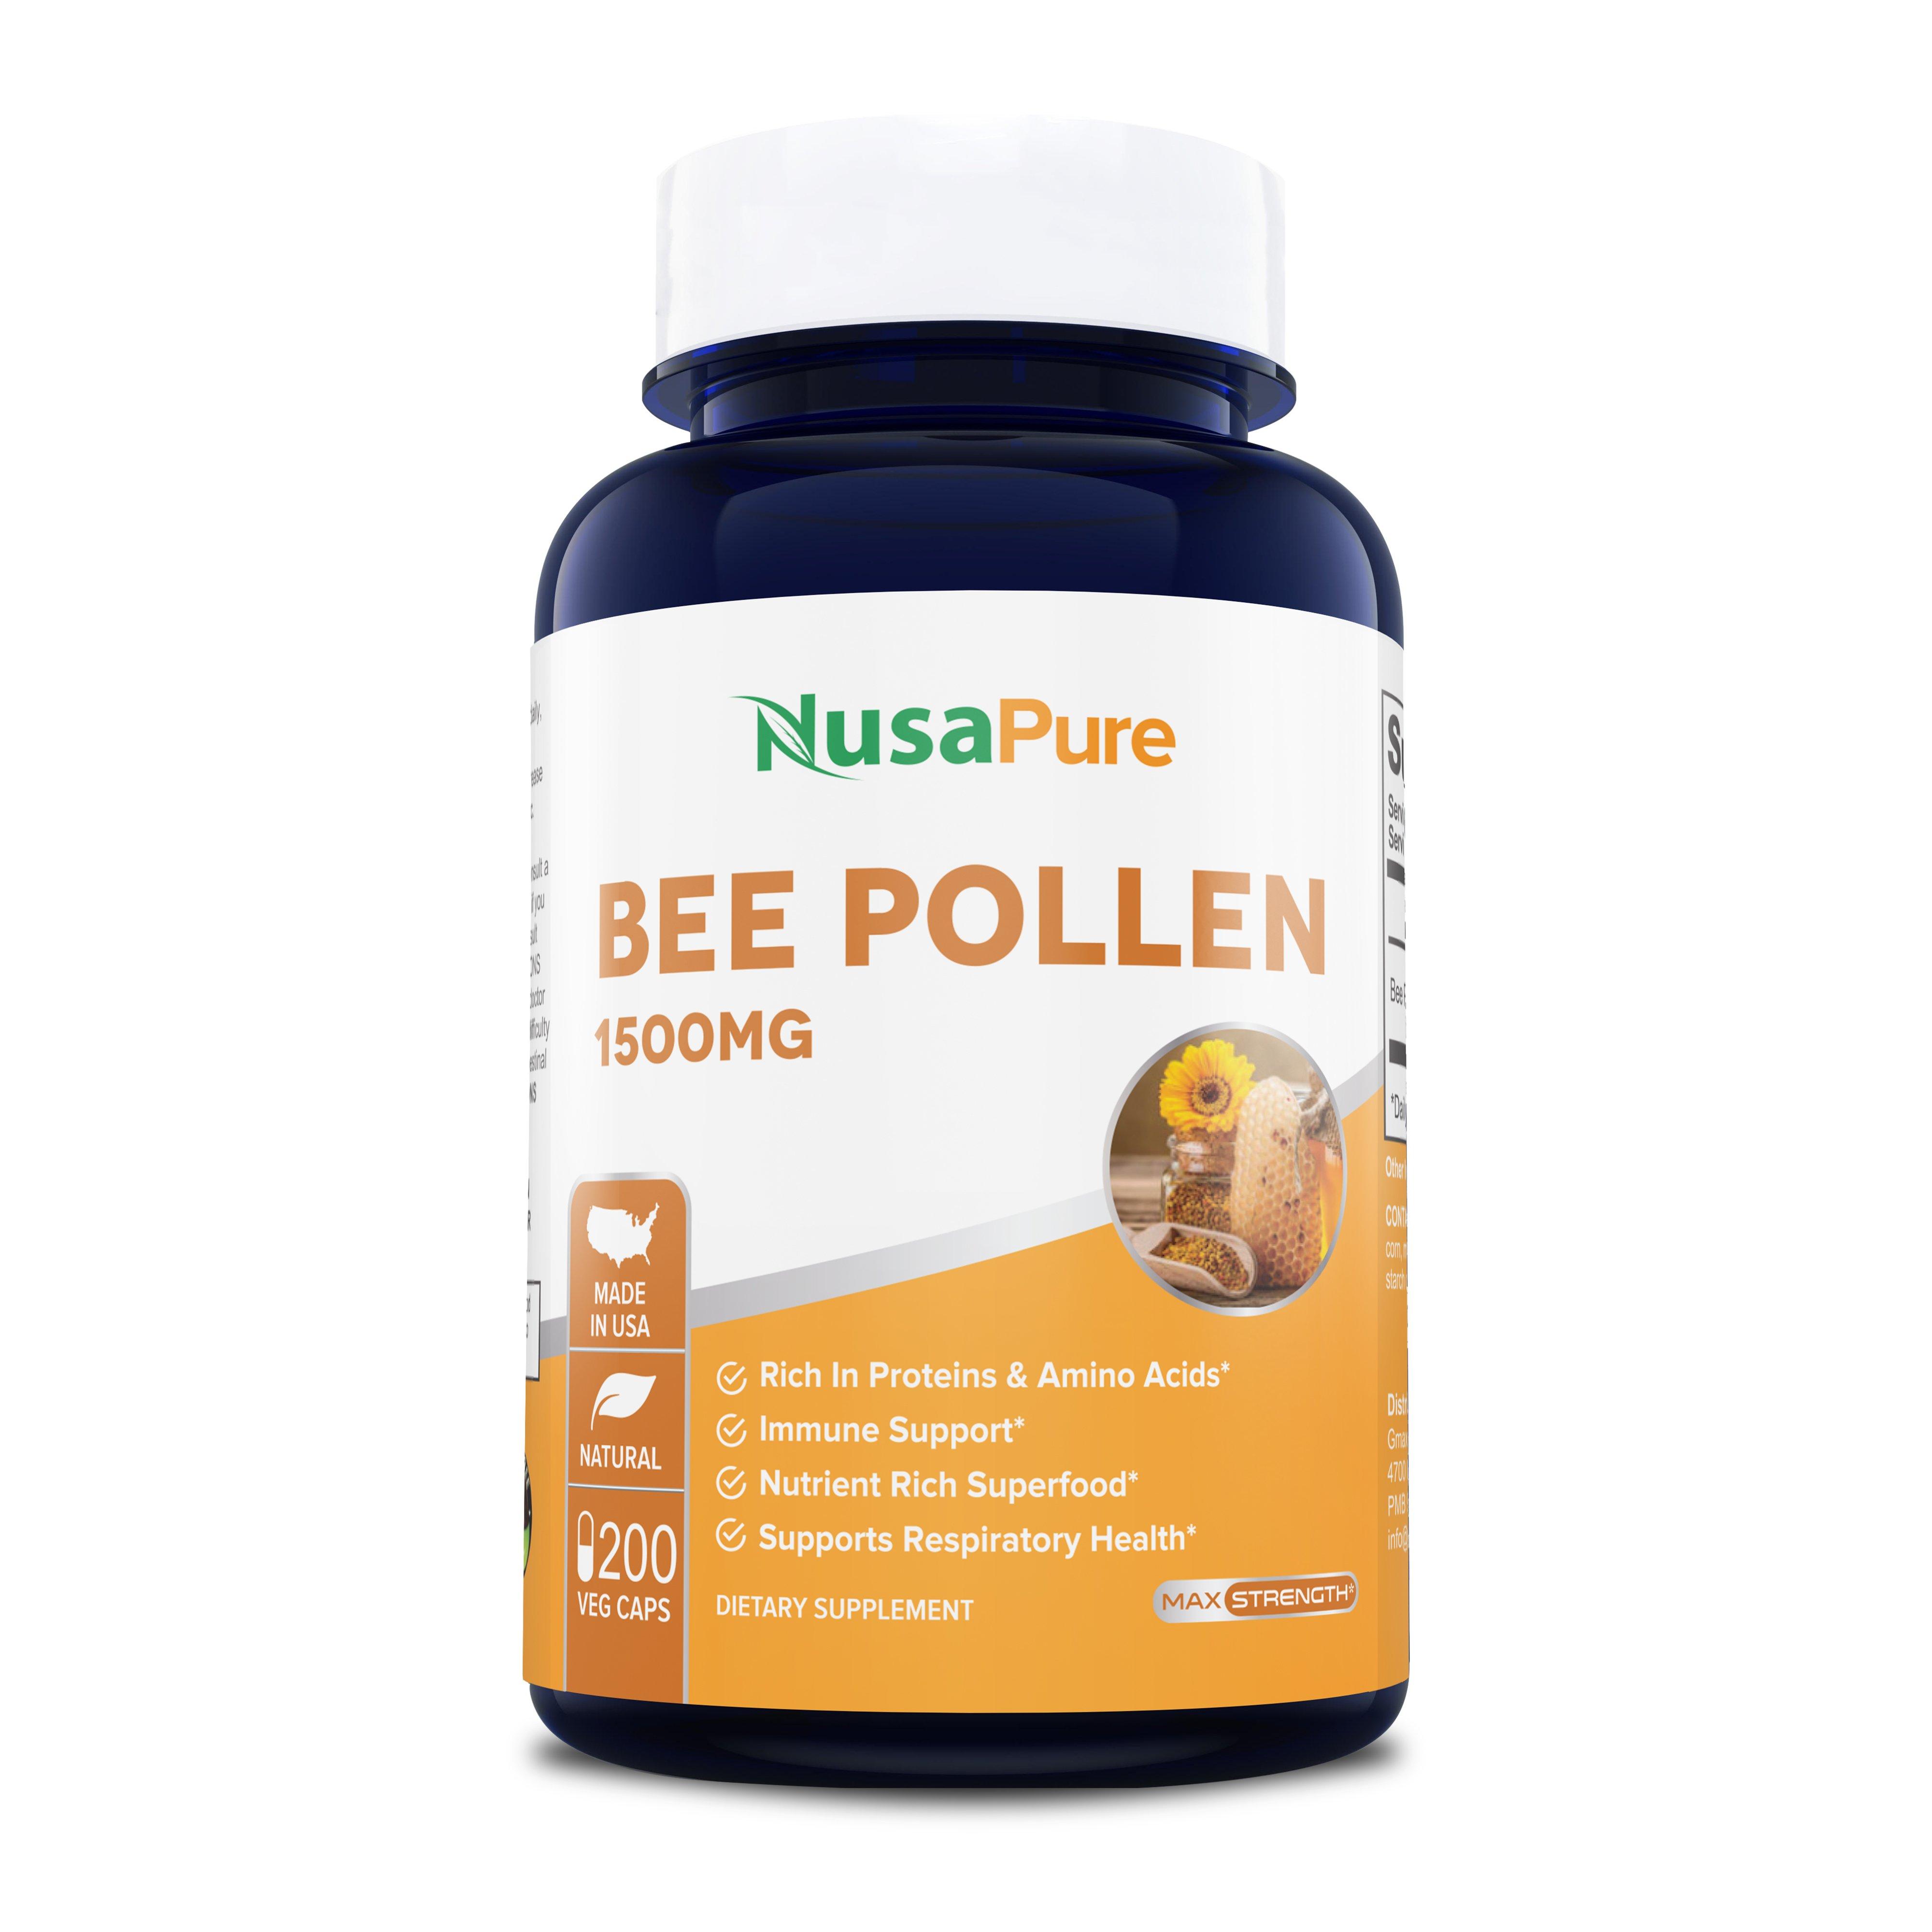 Bee Pollen 1500 mg -  200 Veg Caps (Vegetarian, Non-GMO & Gluten-free)